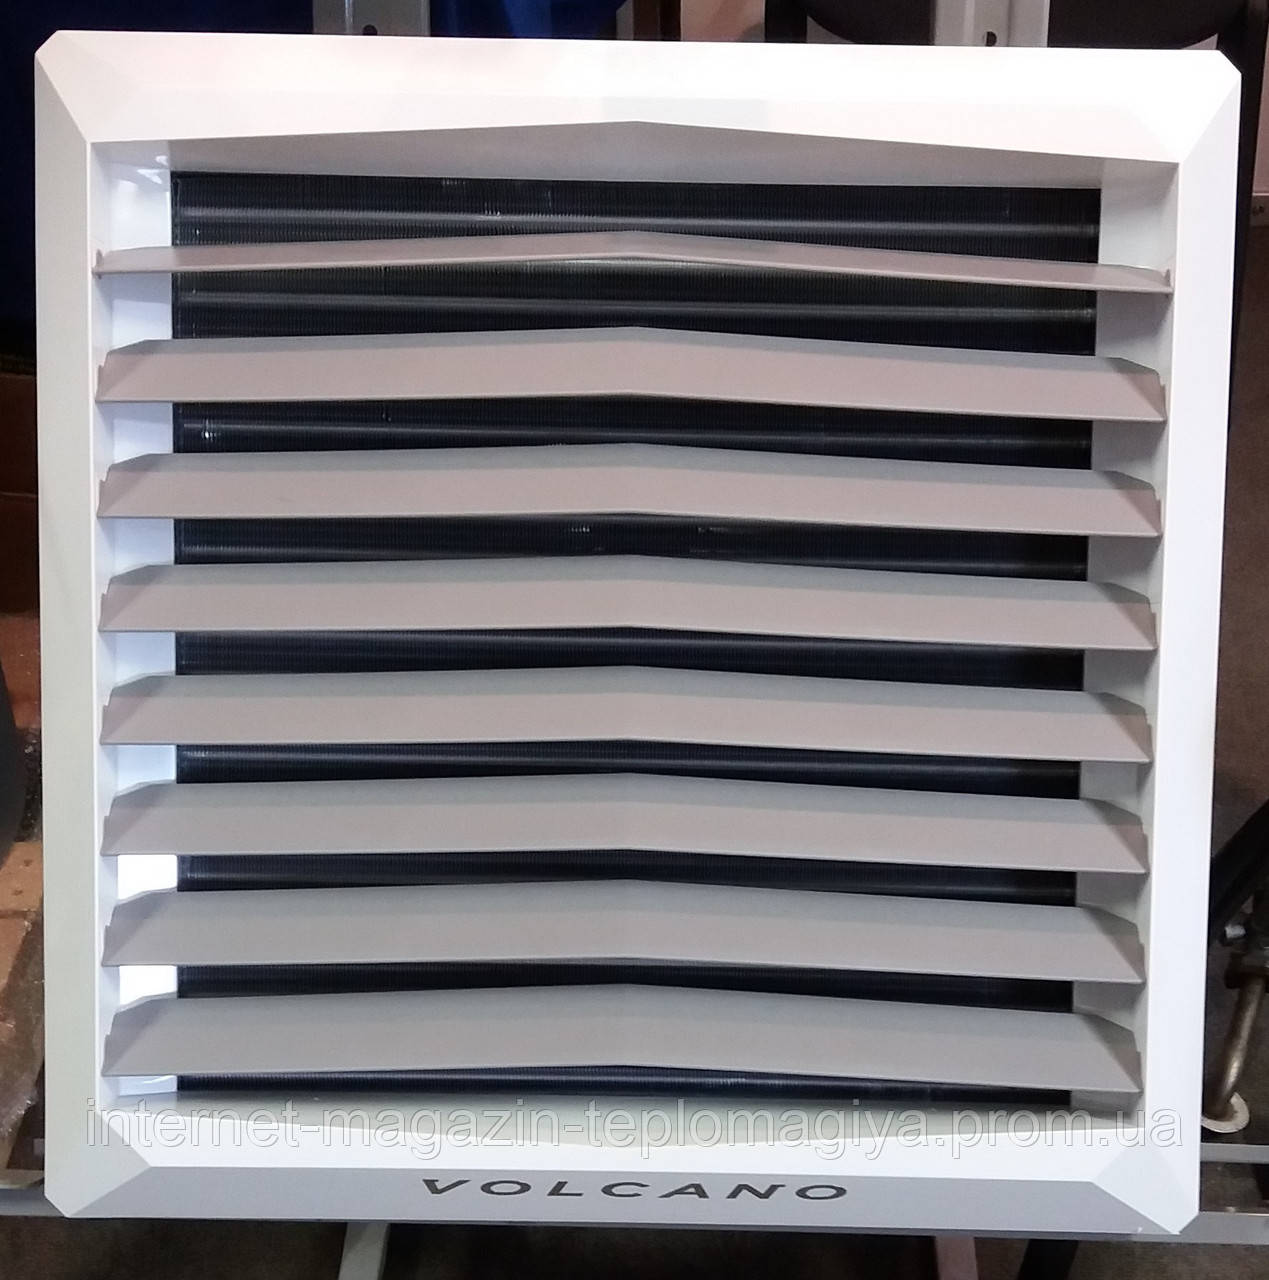 Водяной тепловентилятор Volcano Vr-3 (13-75 кВт)